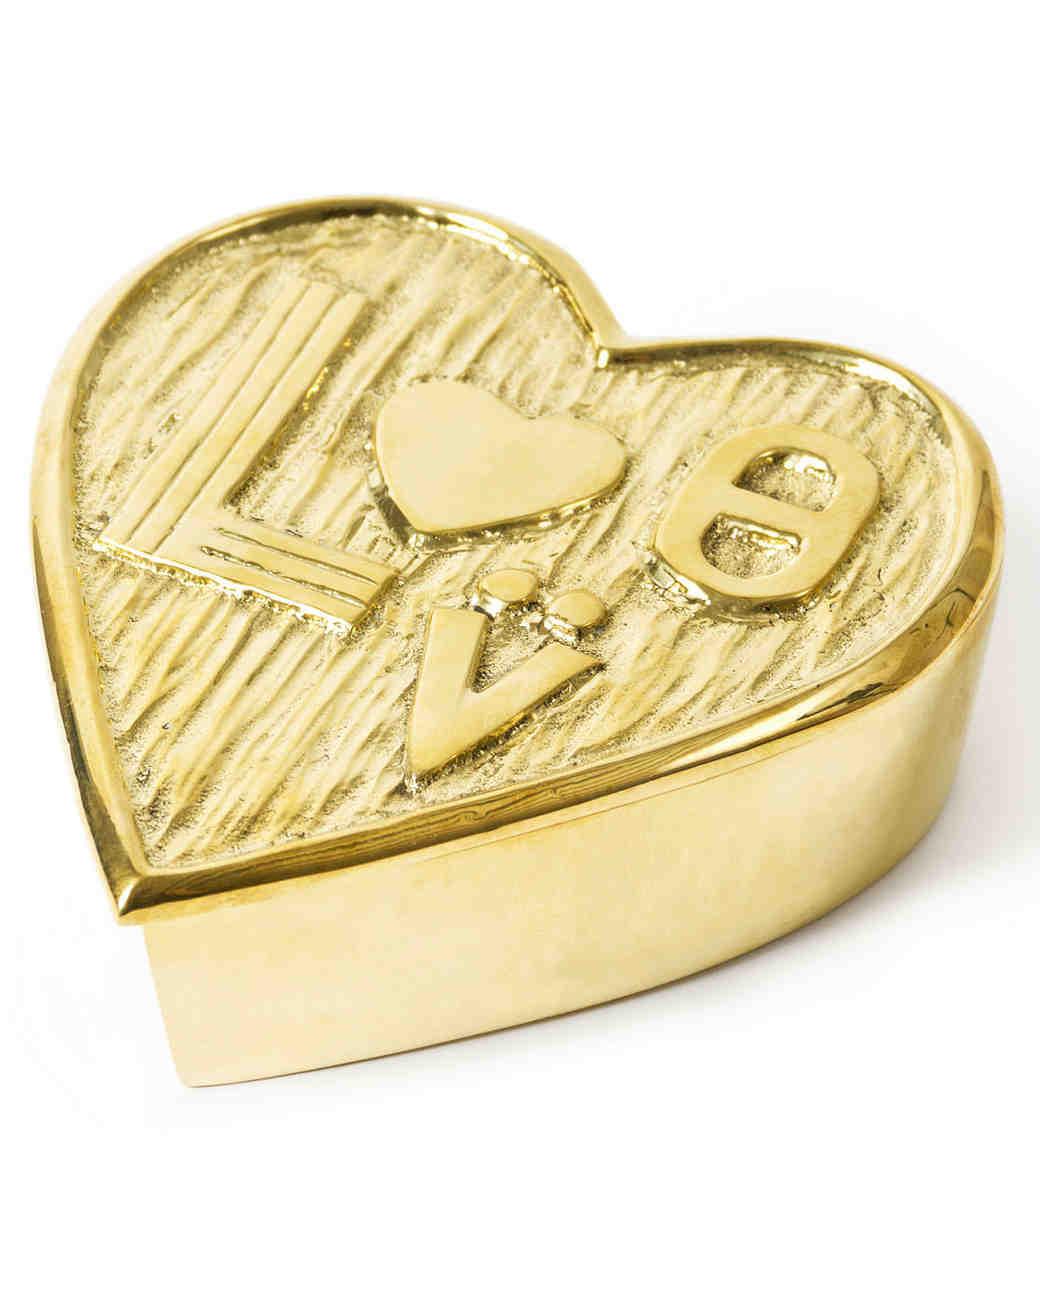 unique-ring-box-love-heart-0316.jpg